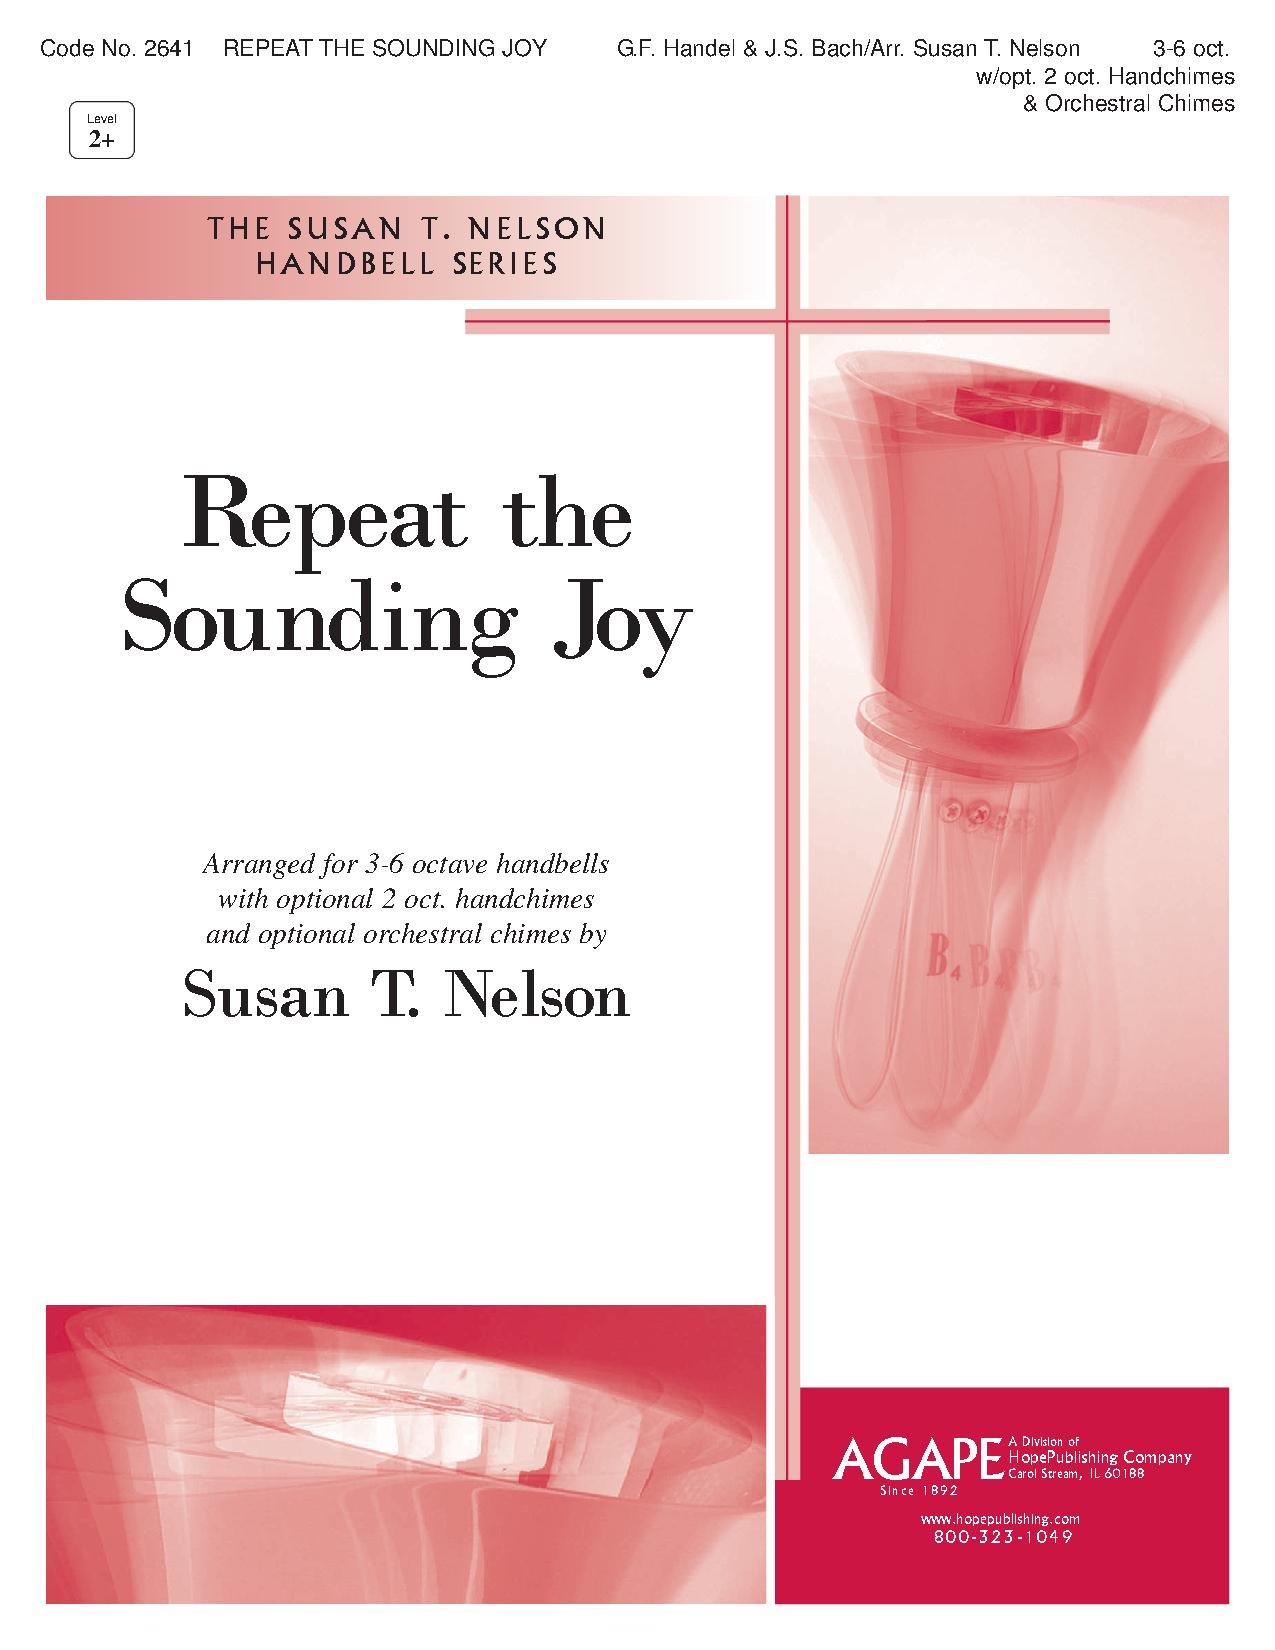 Repeat the Sounding Joy by G.F. Handel & J.S. Bac J.W